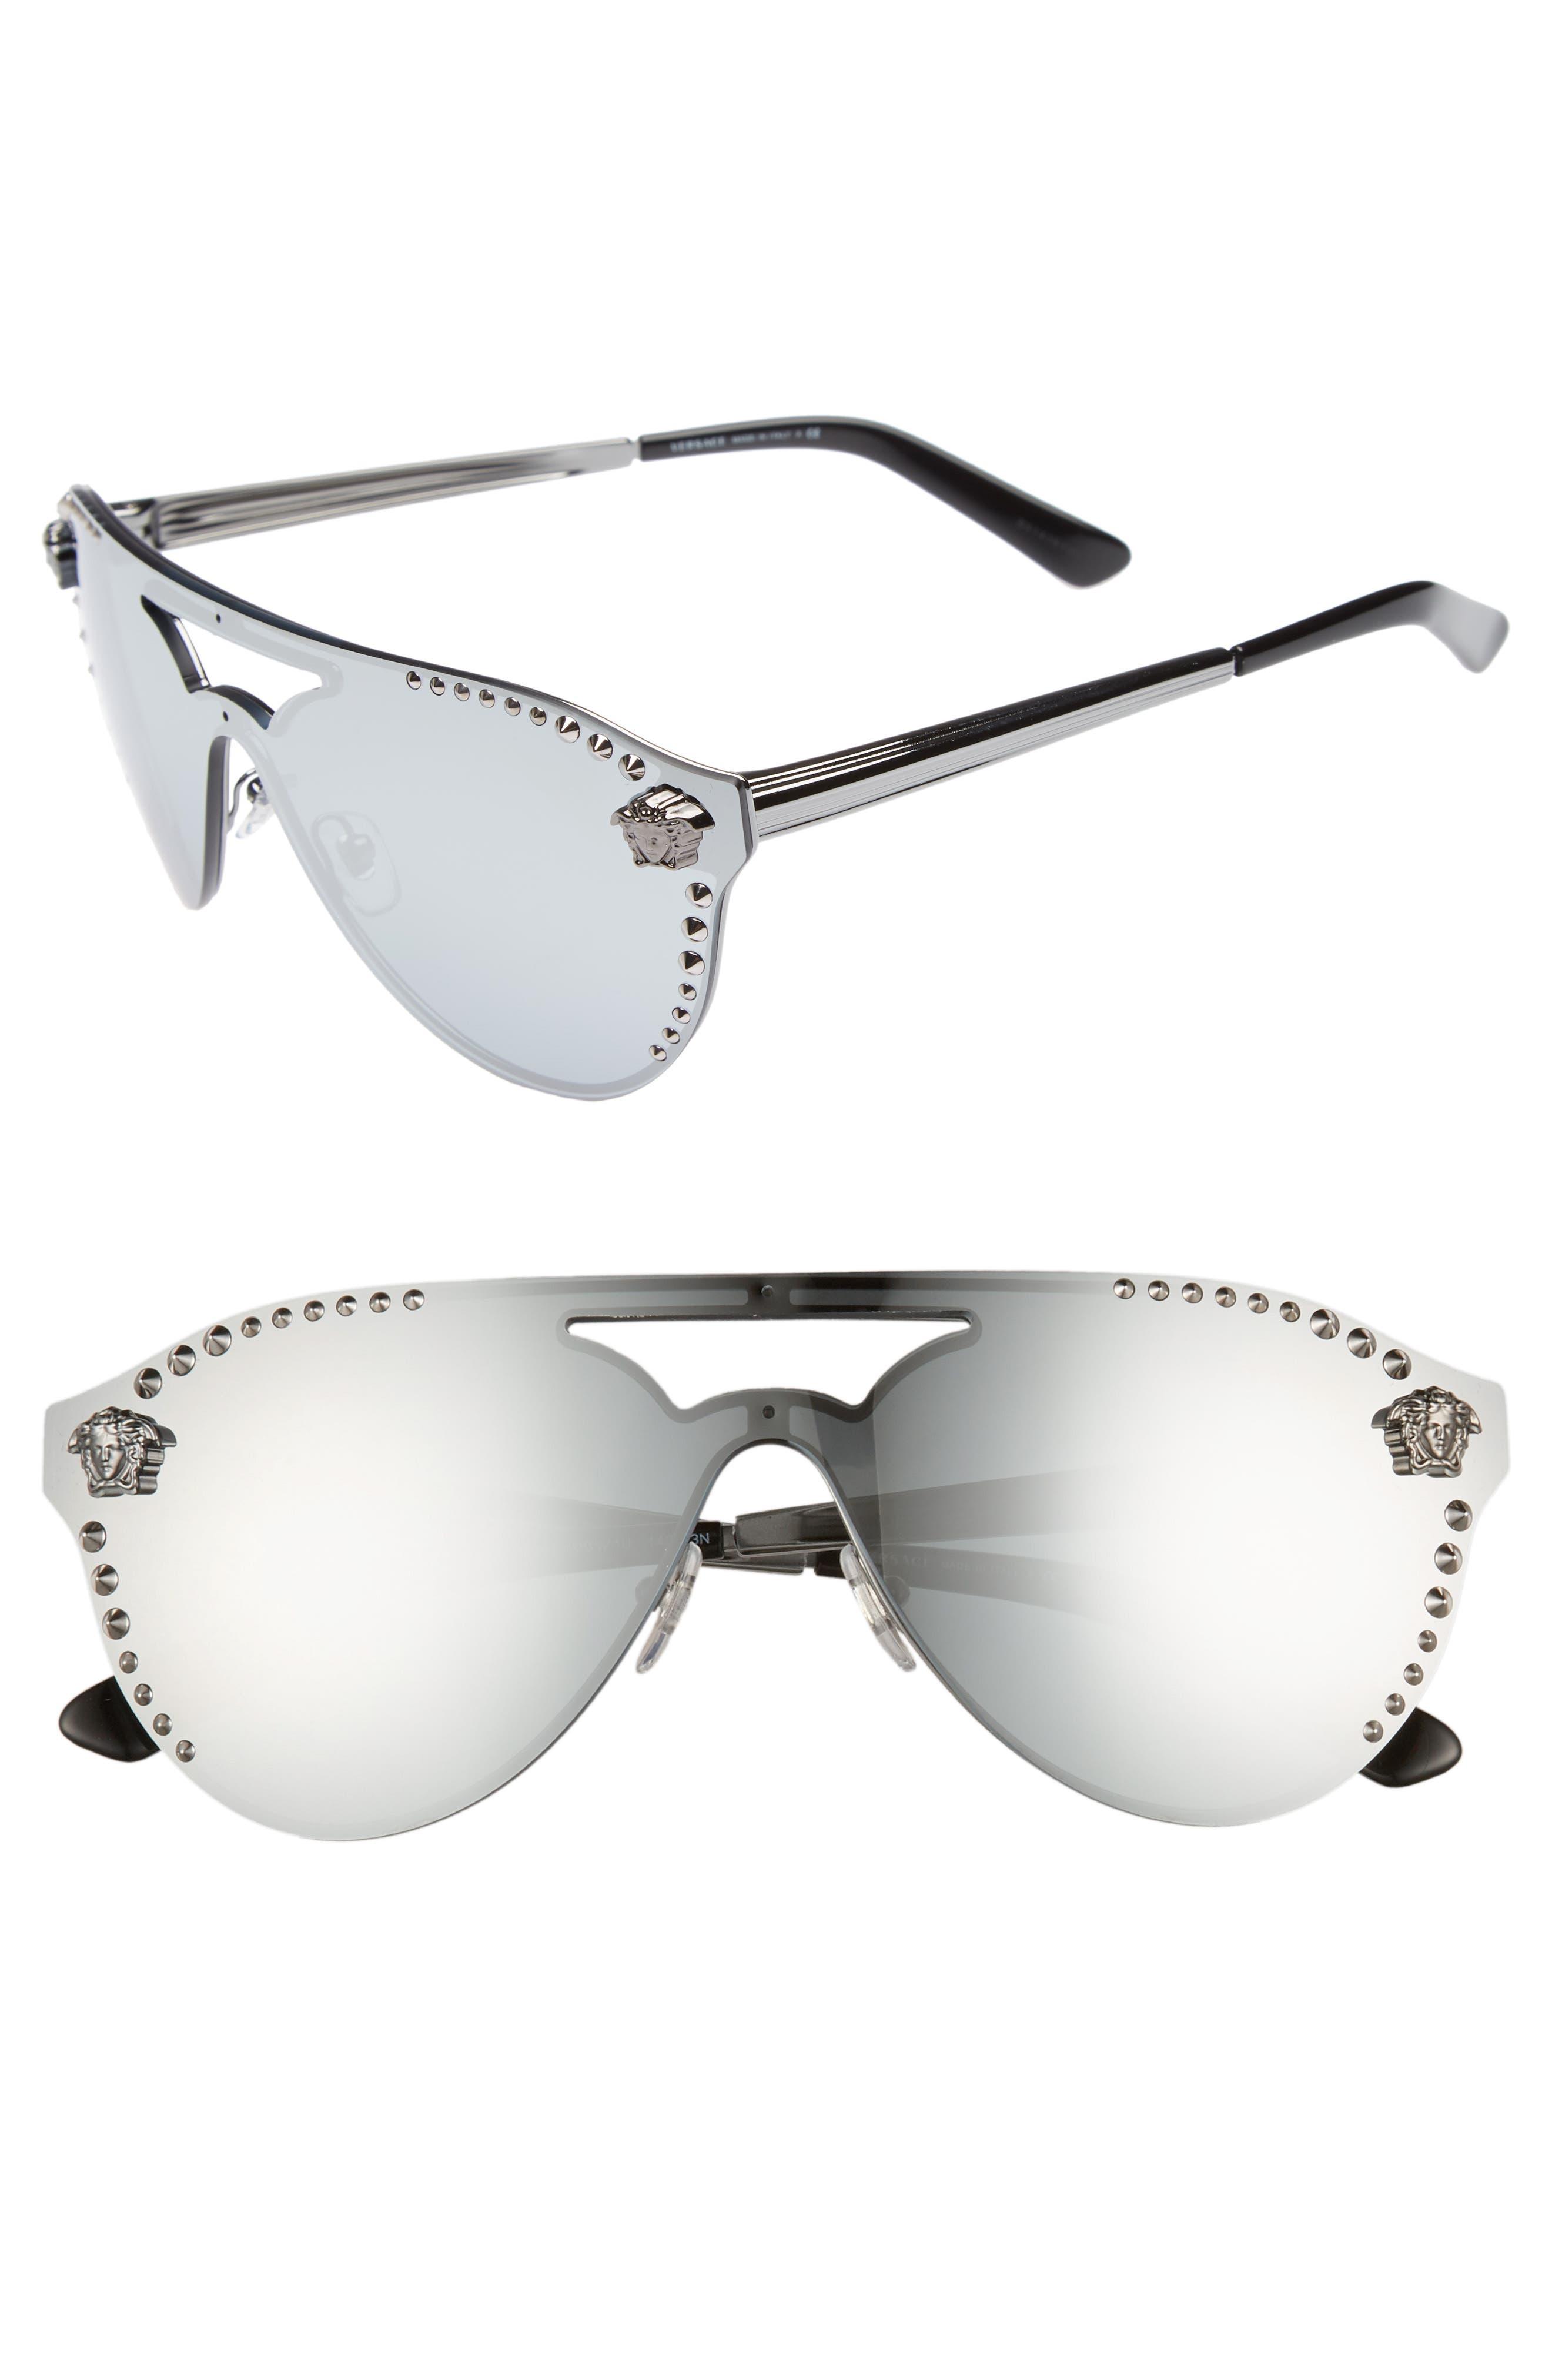 60mm Shield Mirrored Sunglasses,                             Main thumbnail 1, color,                             GUNMETAL MIRROR